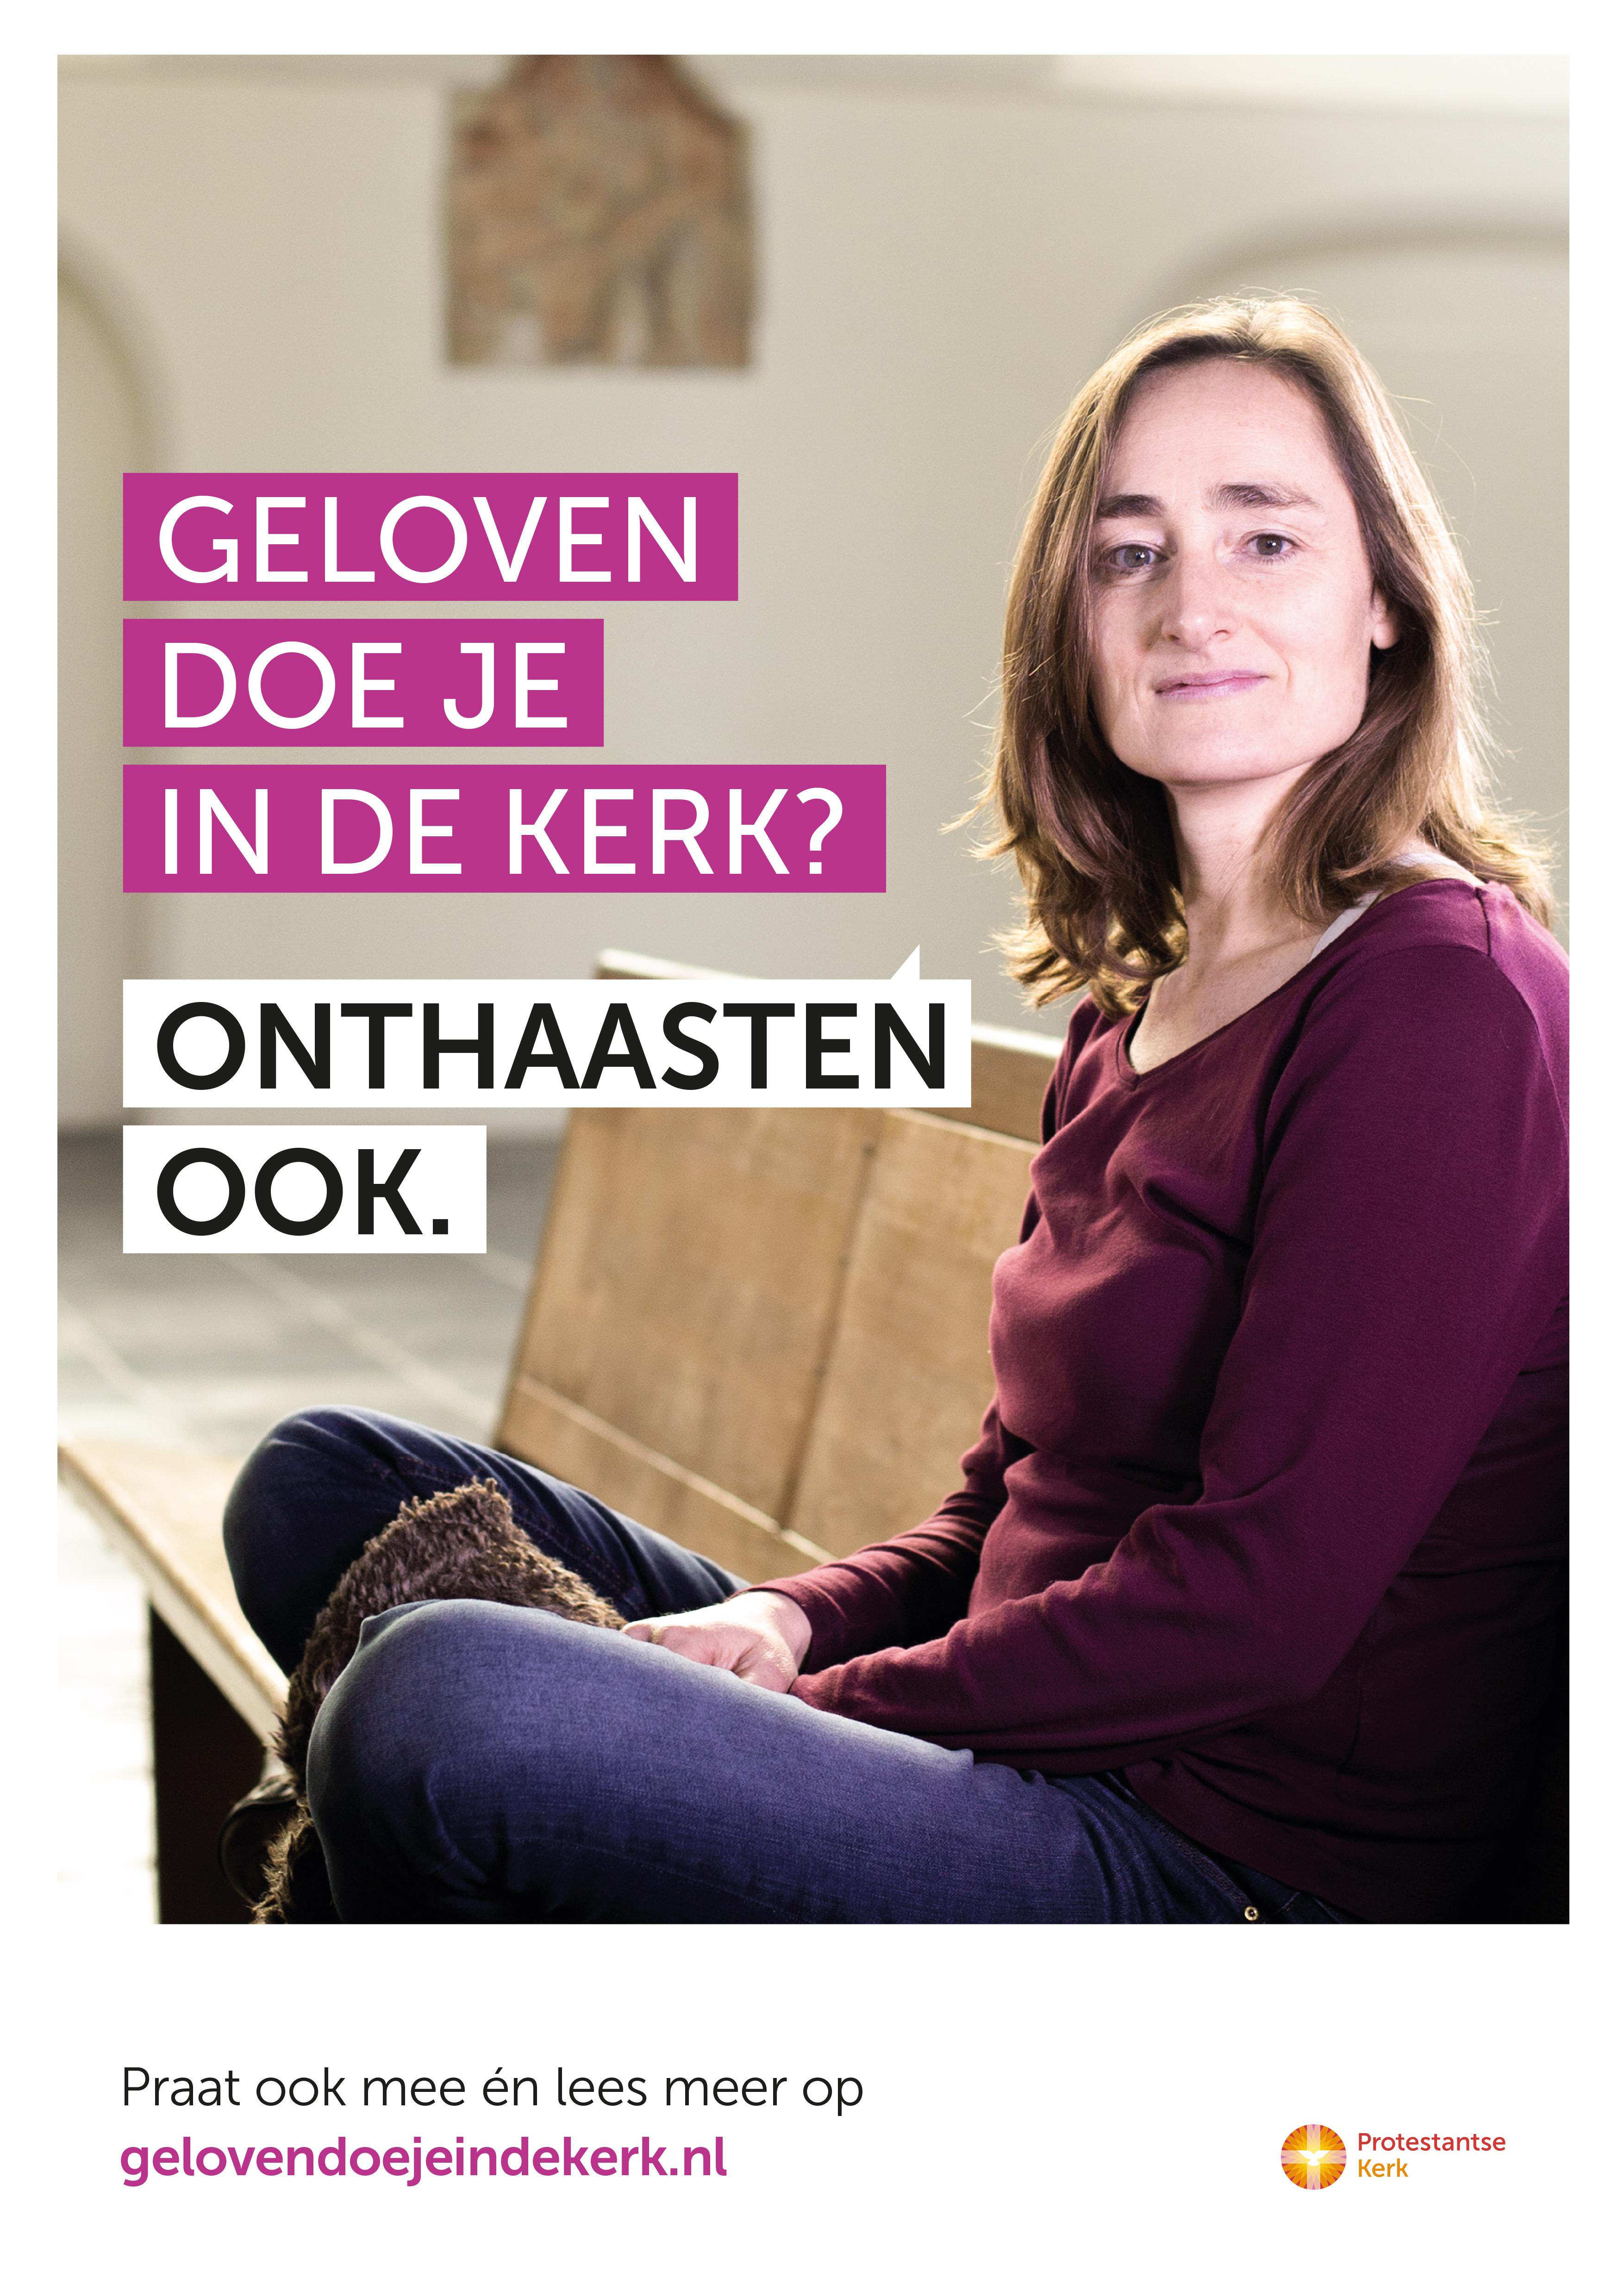 http://pkn-gravenpolder.nl/wp-content/uploads/2017/01/Print_Anna.jpg